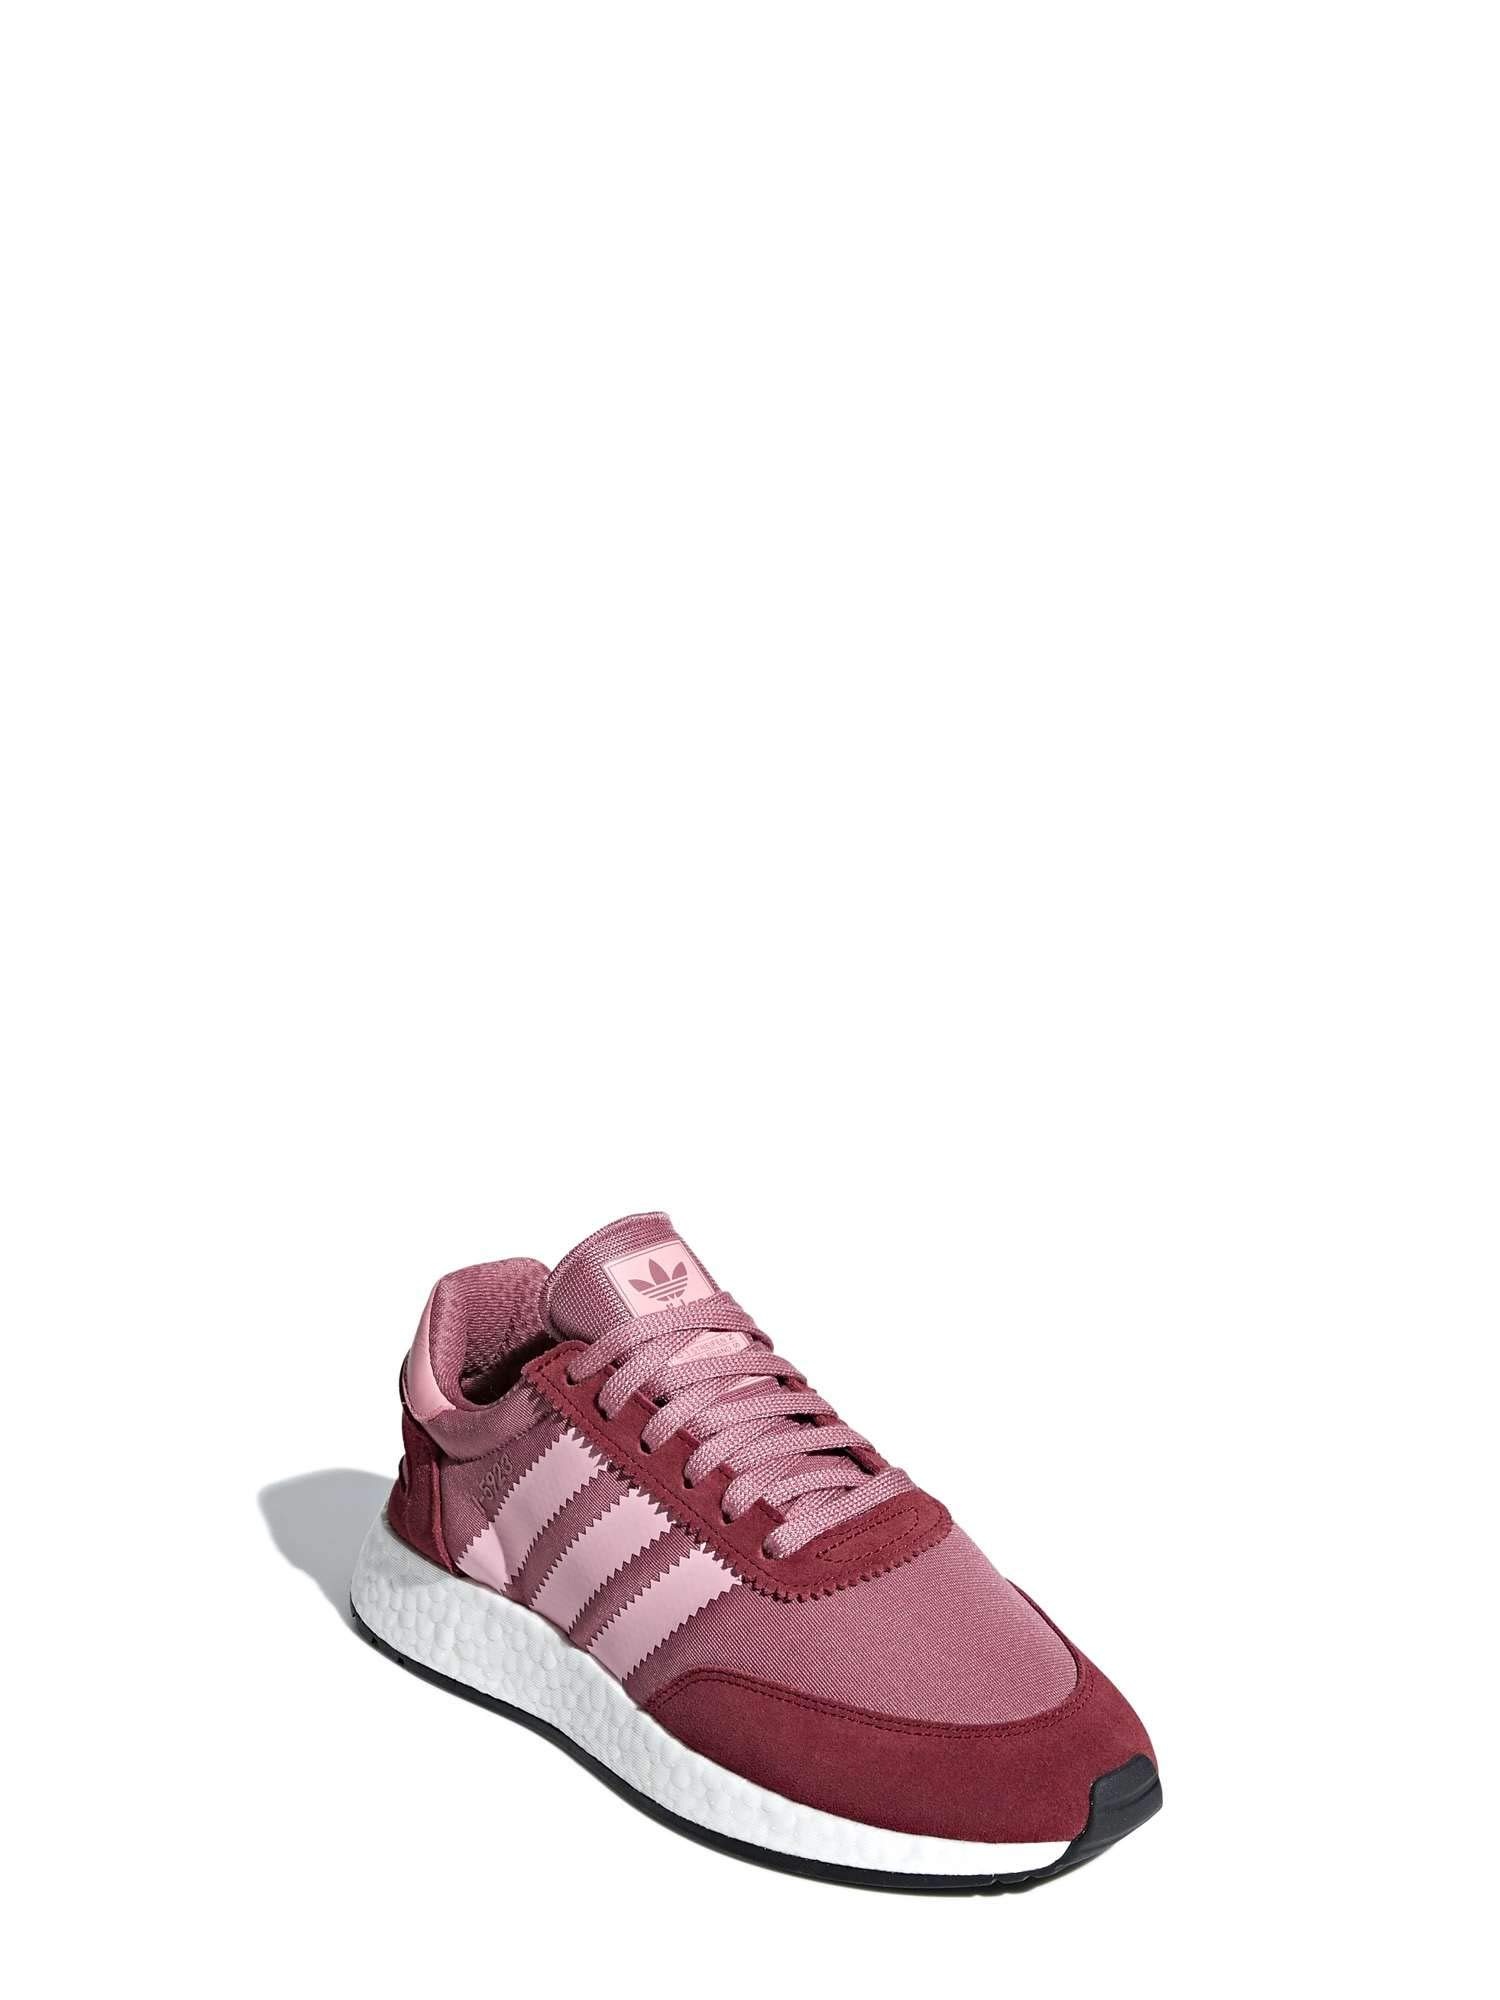 adidas Originals I-5923 Women 4 spesavip